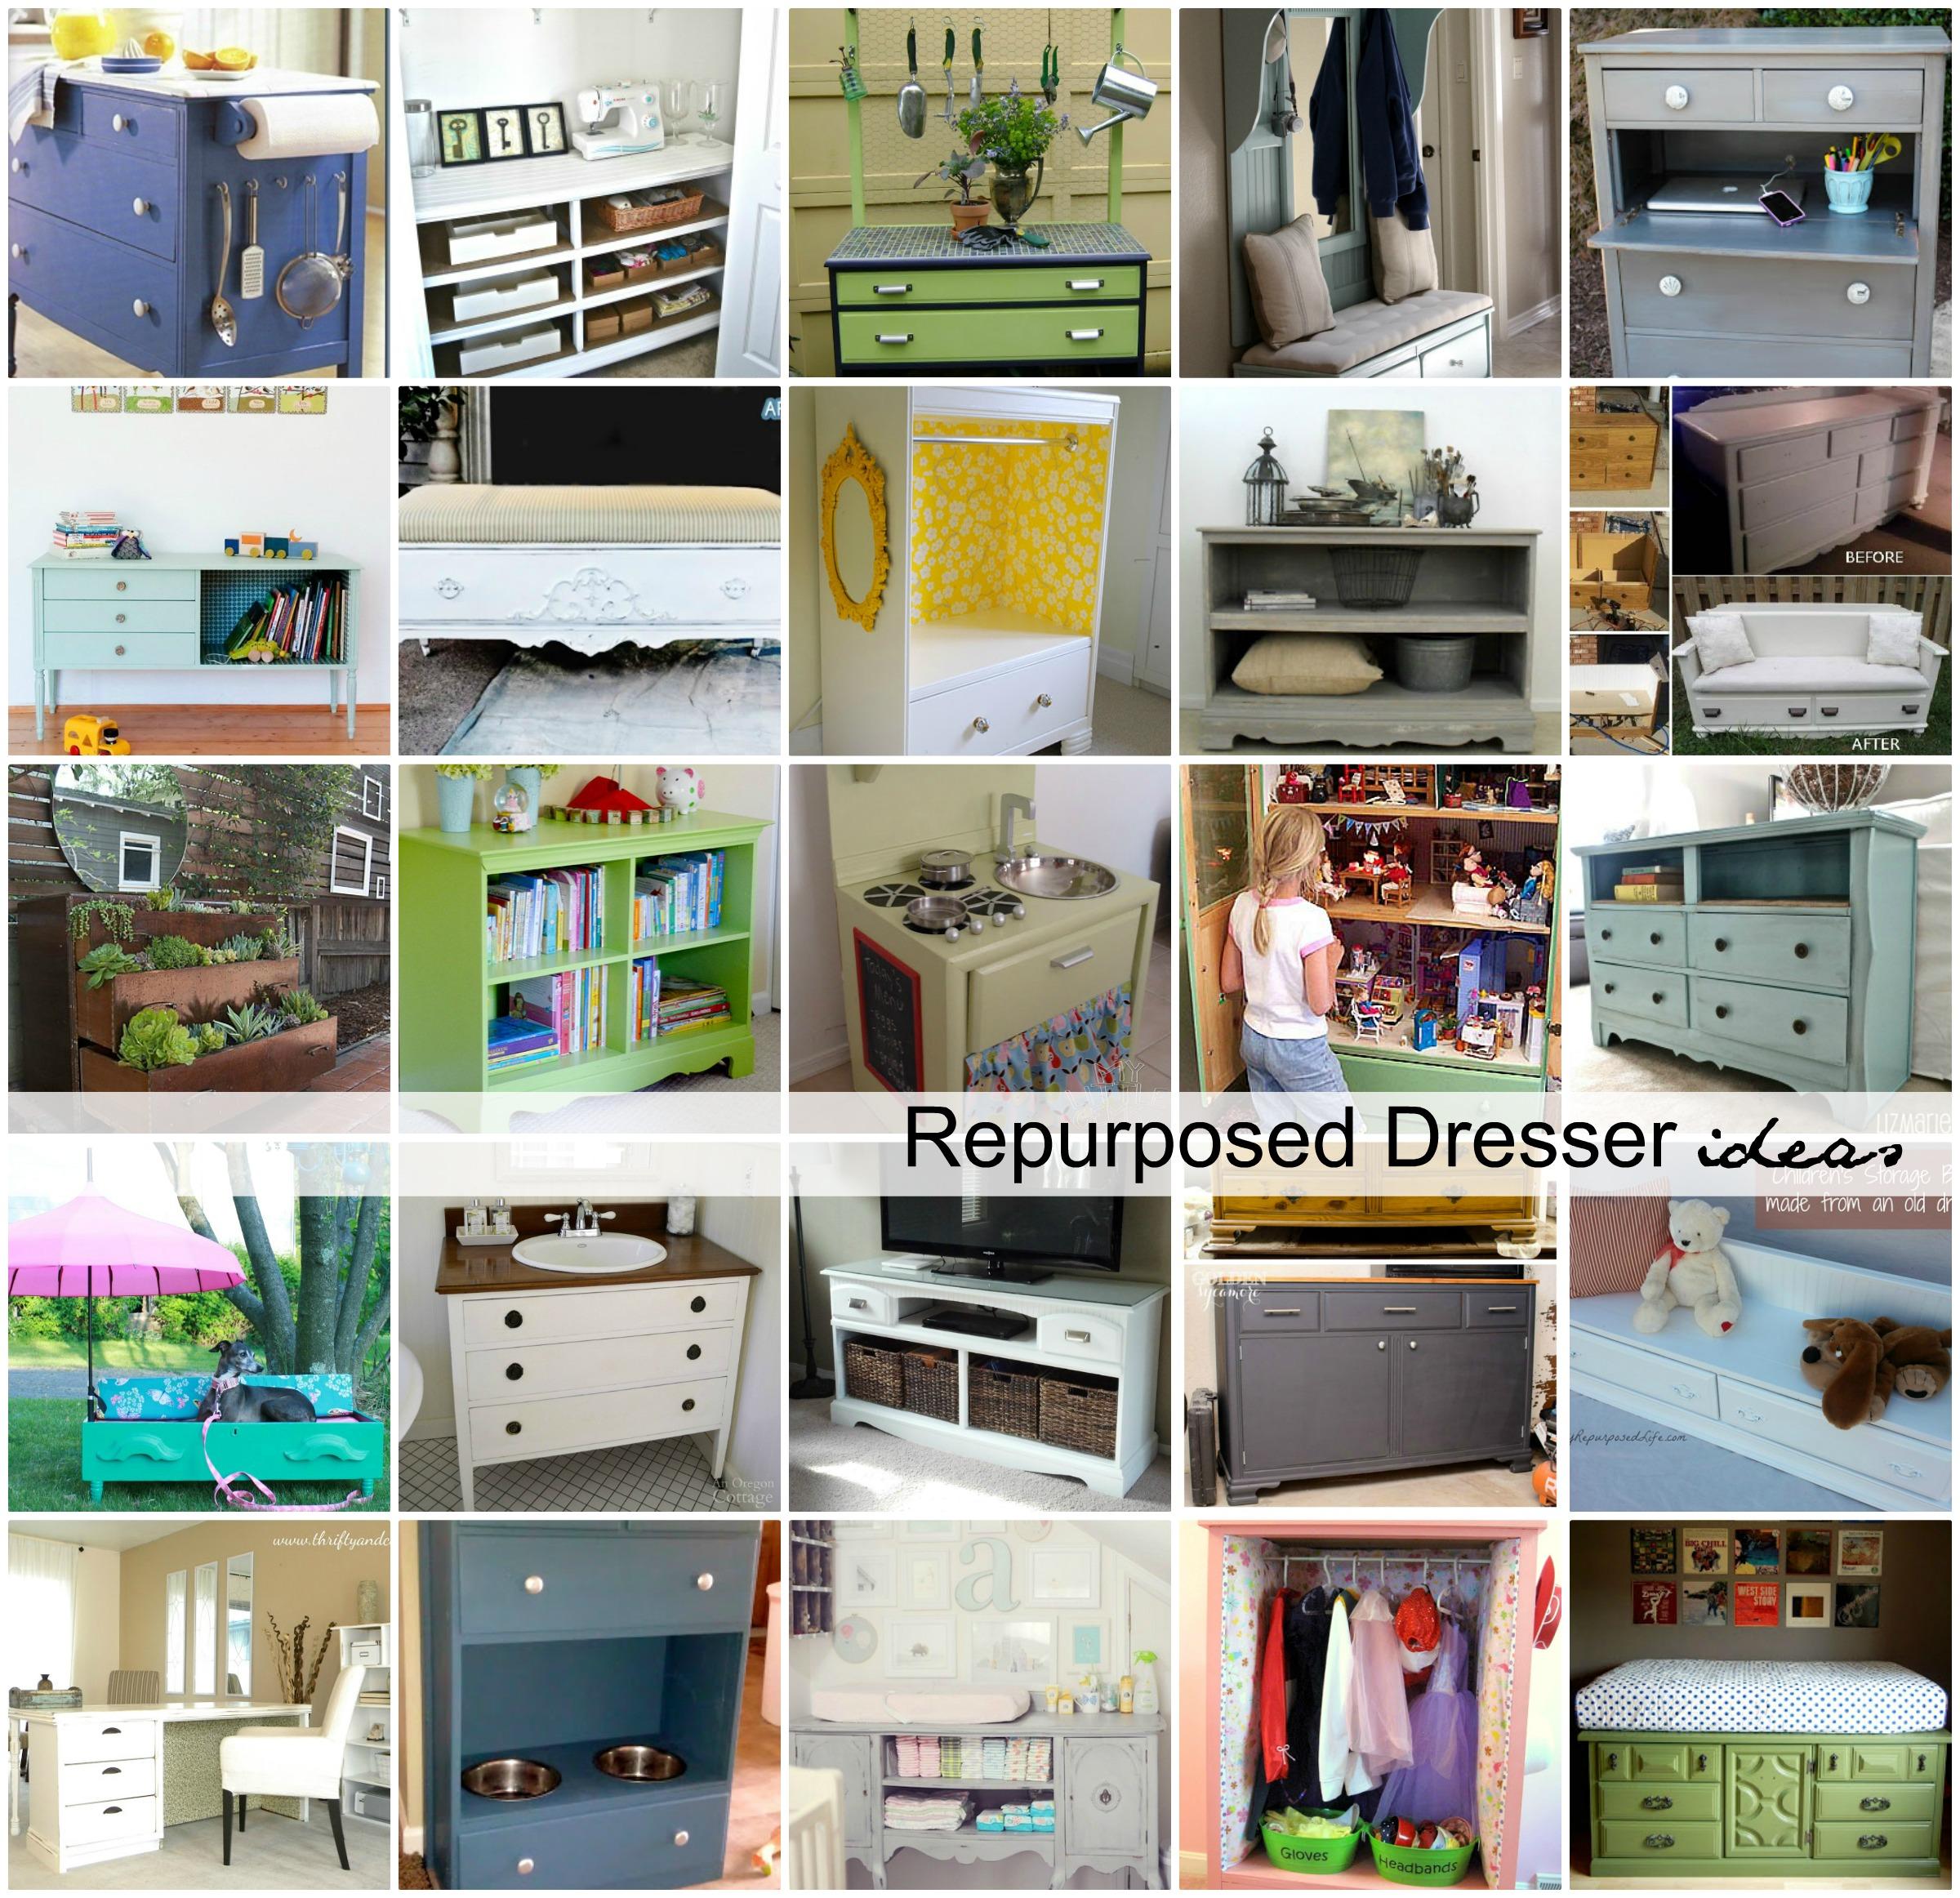 repurposed-dresser-diy-project-1 (1)